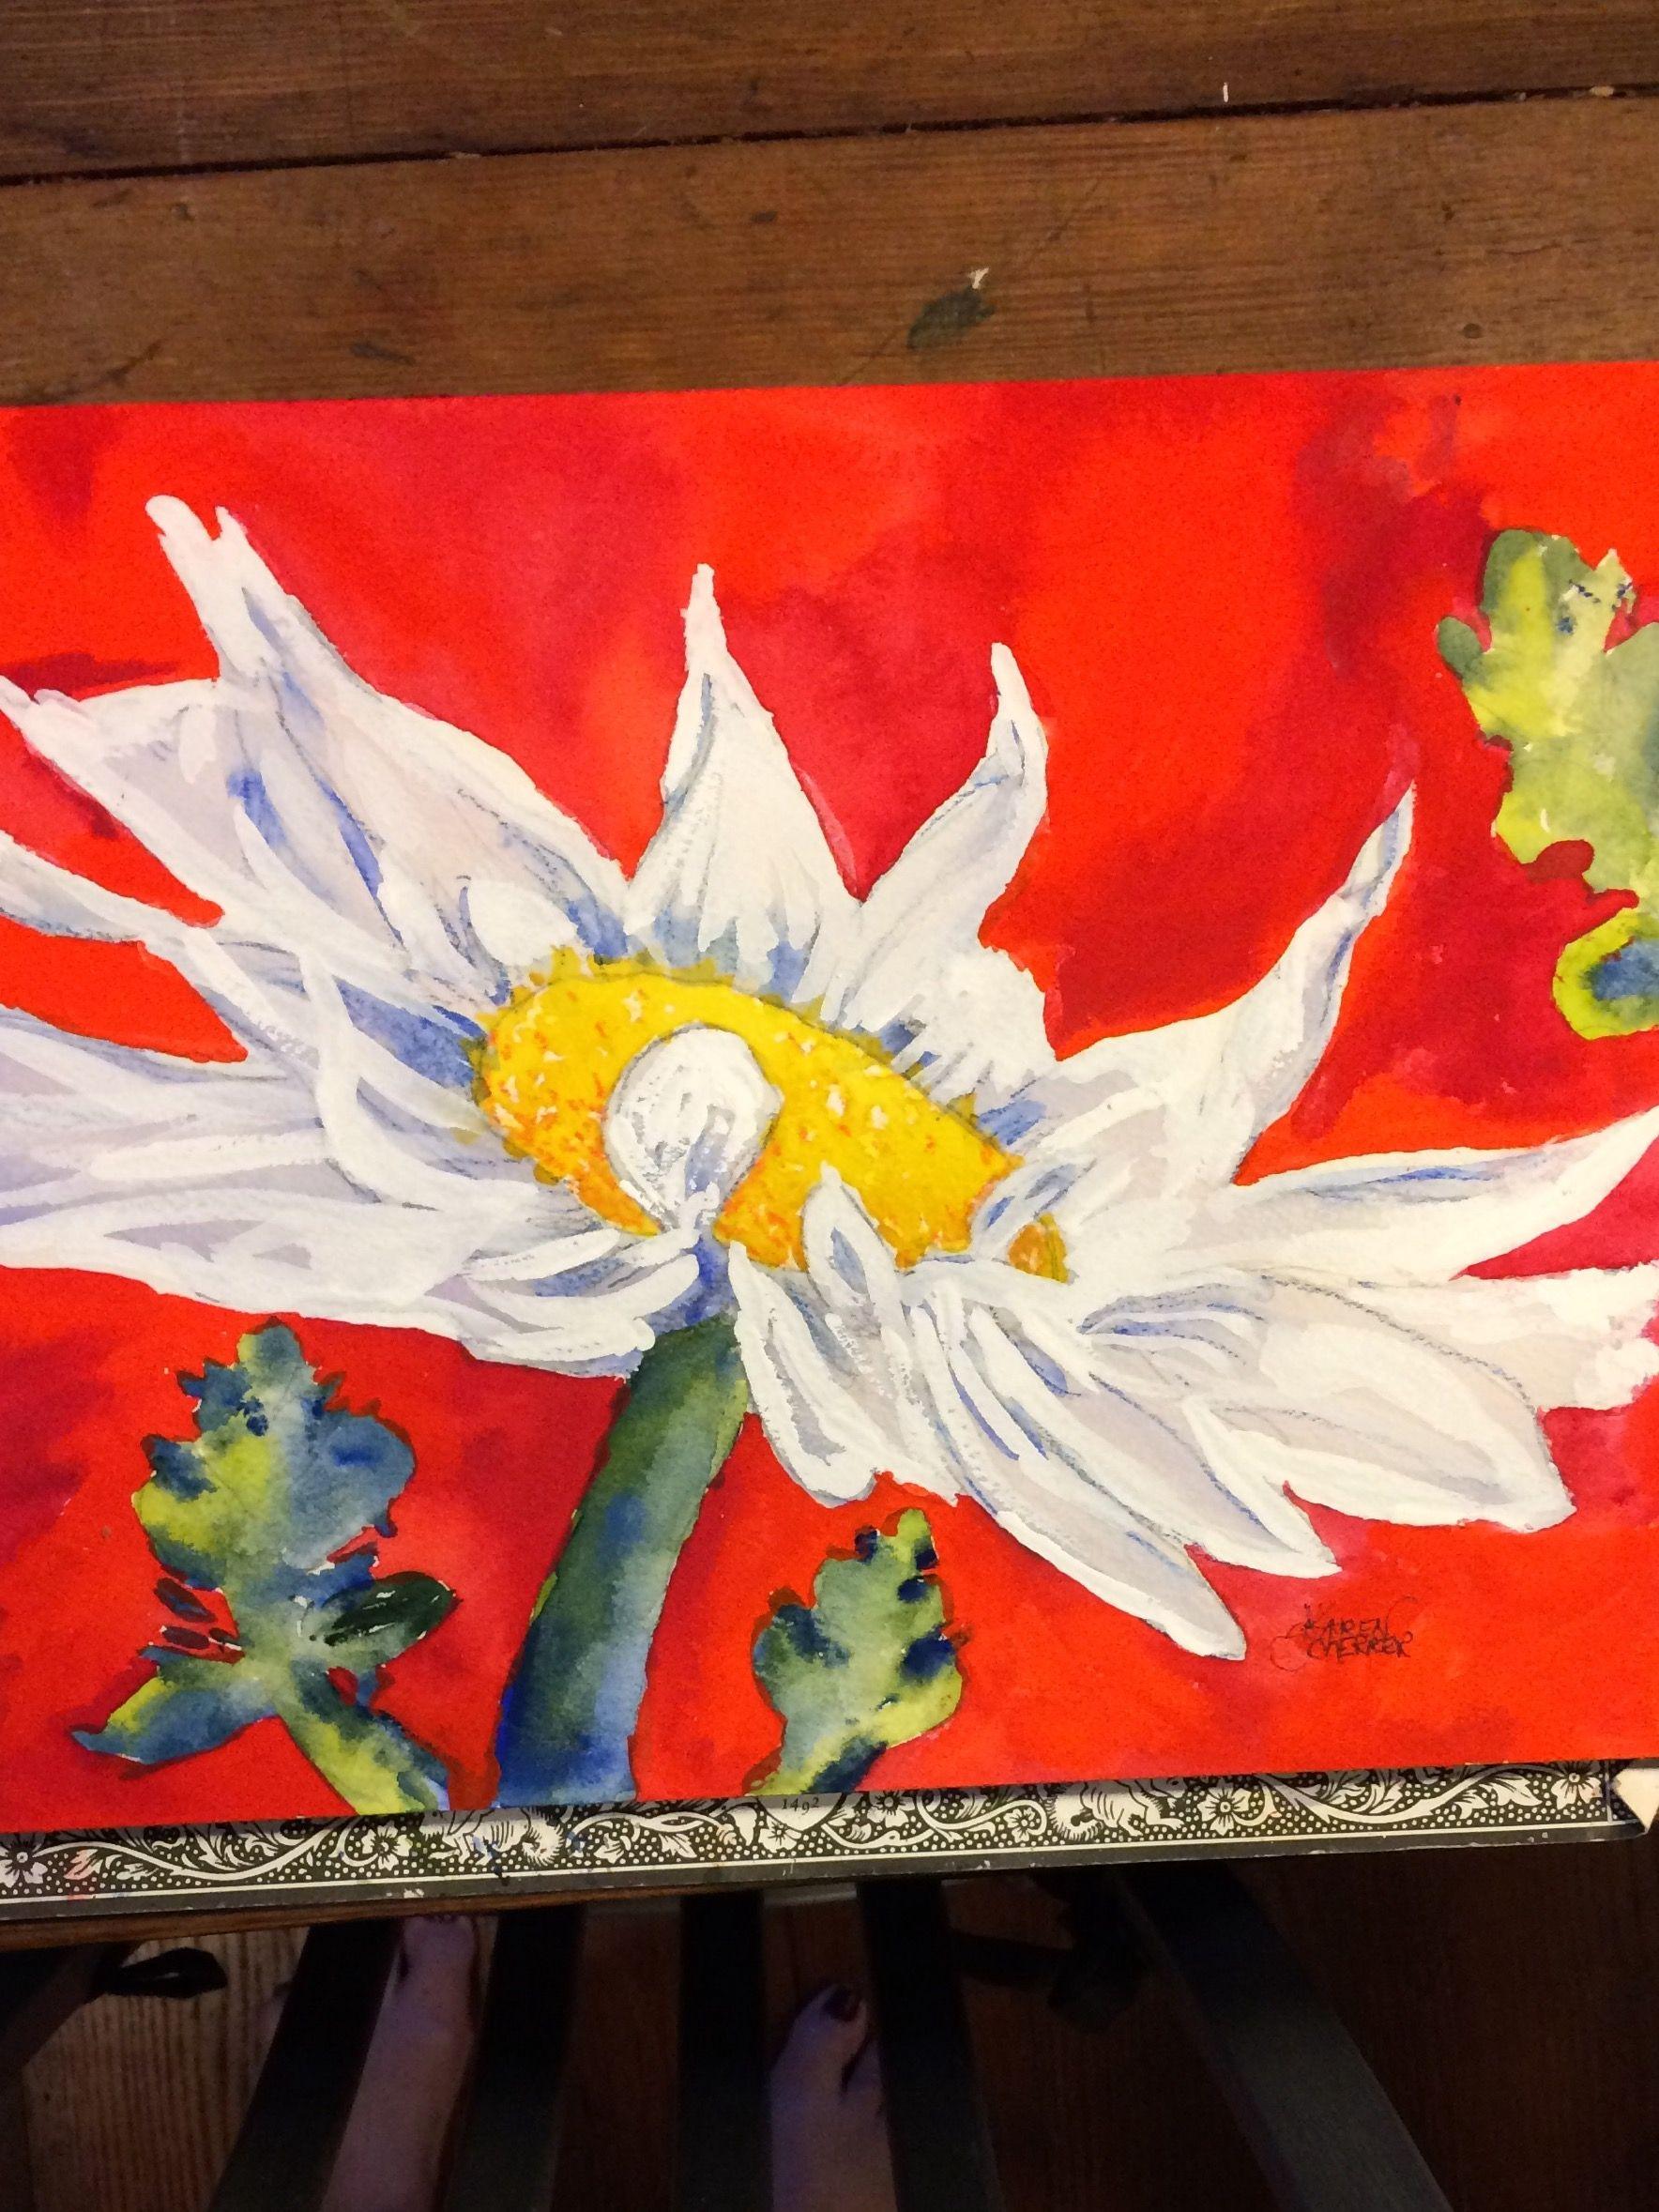 Watercolor artist in texas -  He Loves Me He Loves Me Not By Texas Watercolor Artist Karen